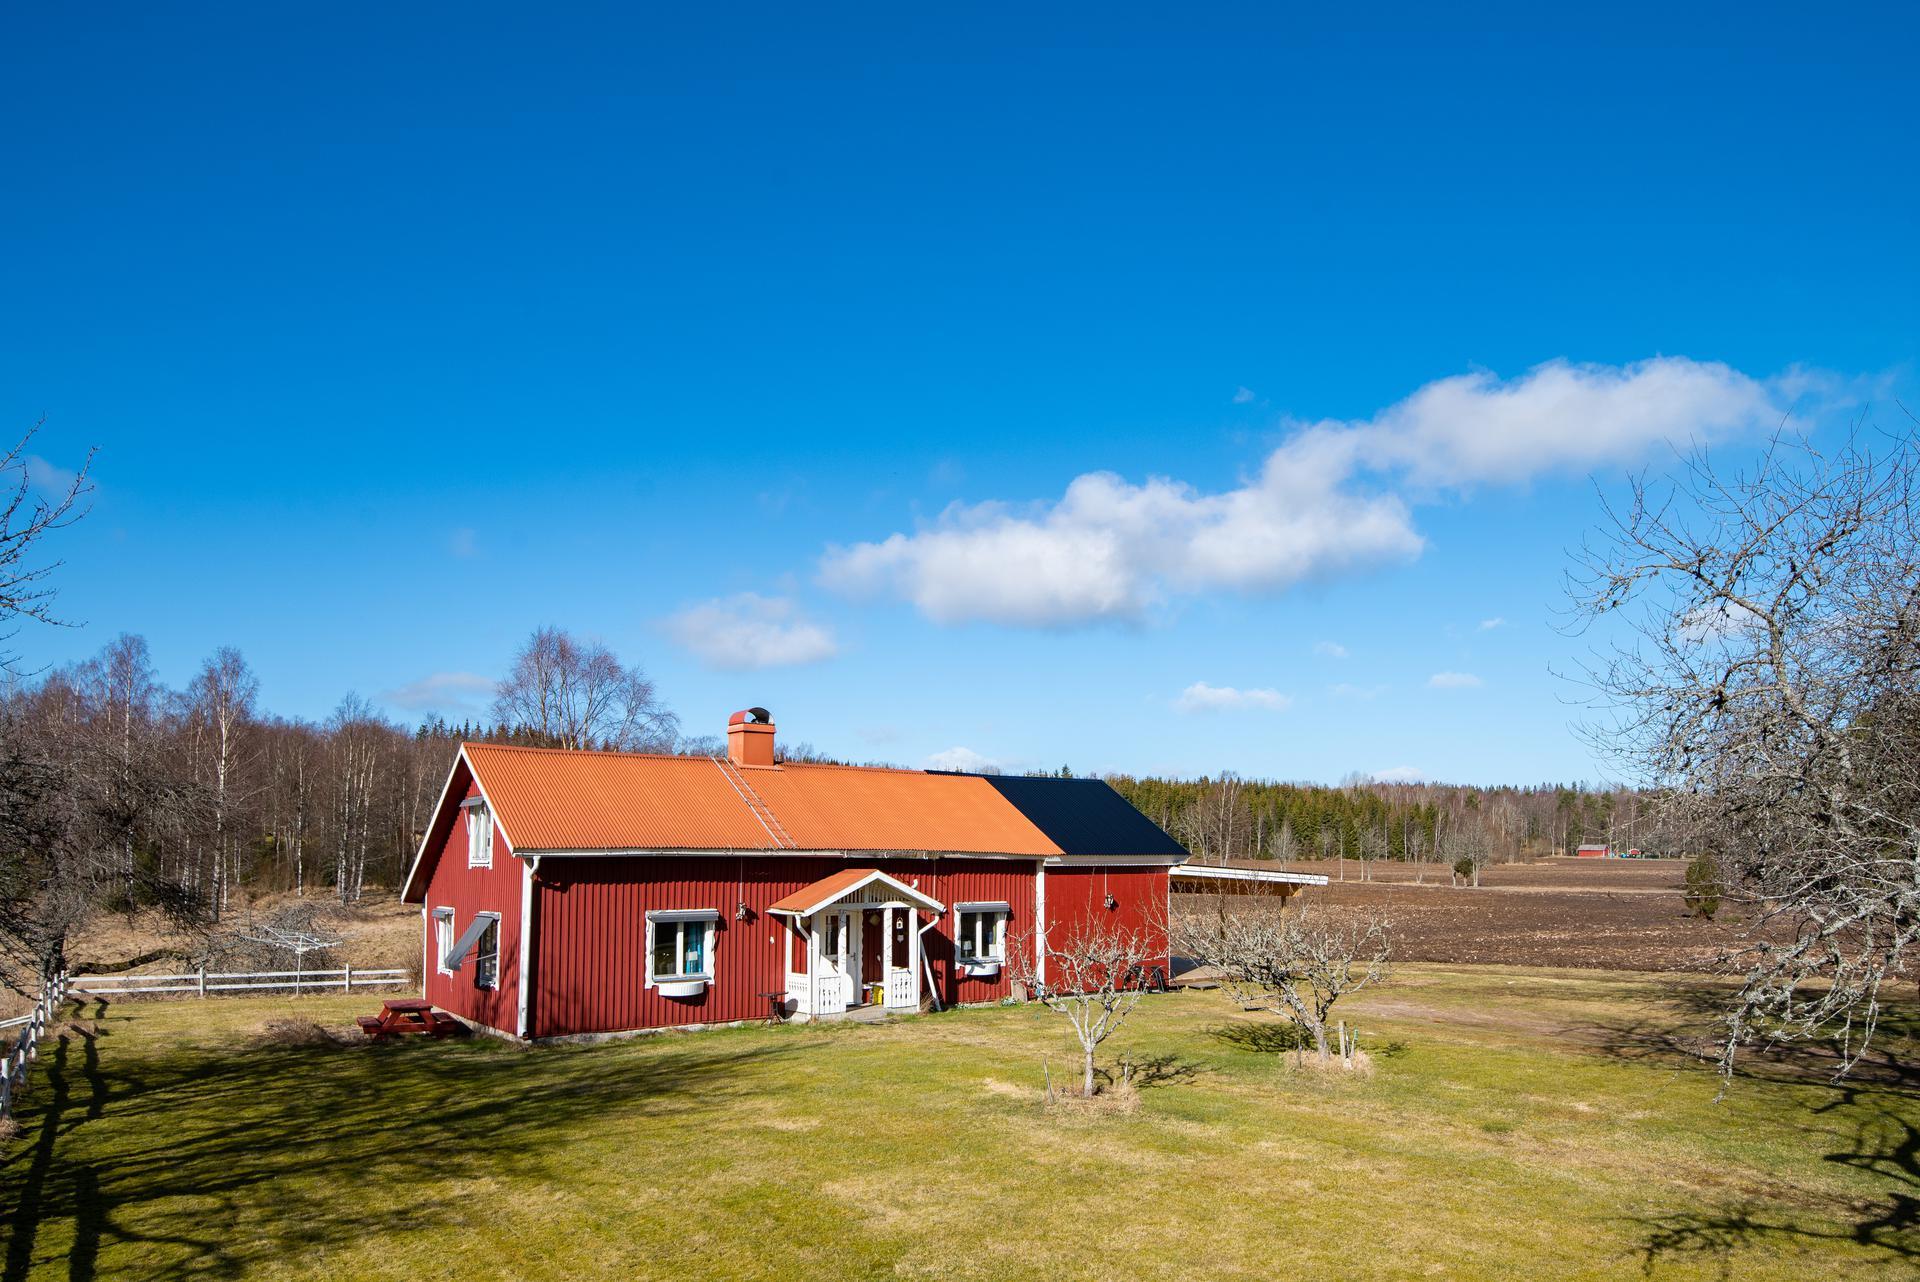 Ove Norell, Dimbo Stora Hga, Tidaholm | redteksystems.net